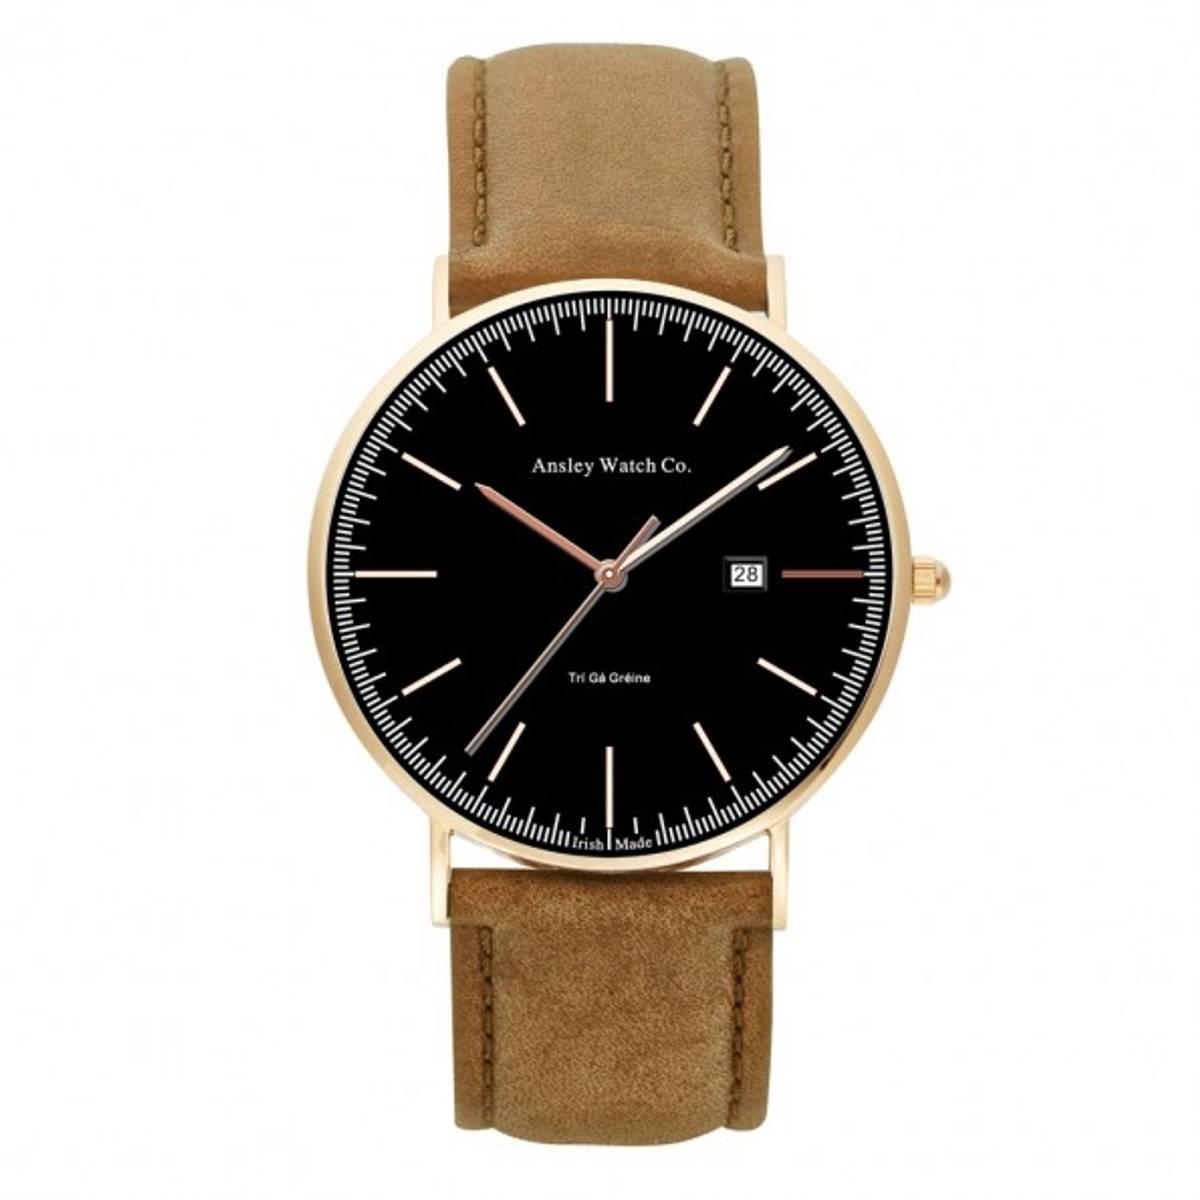 Ansley unisex watch AW421